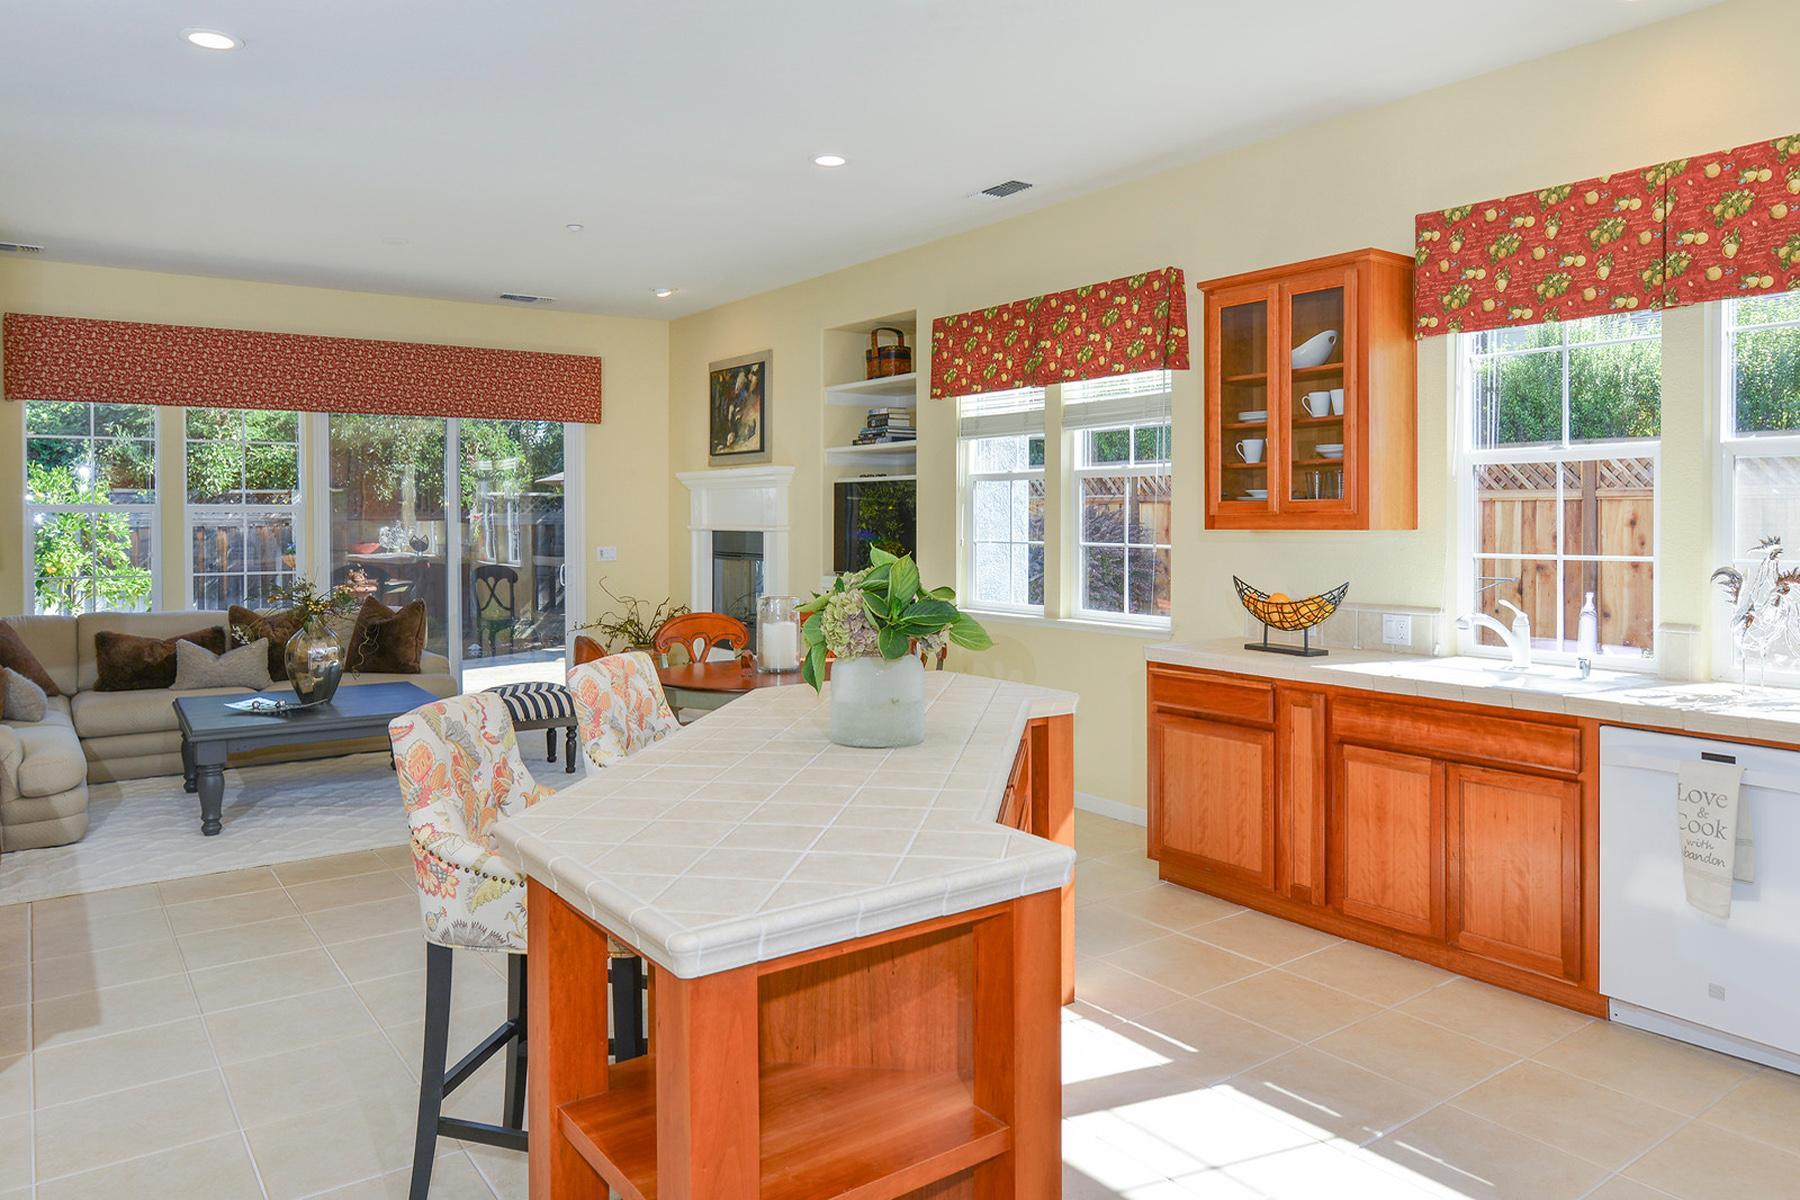 Single Family Home for Sale at 146 Old Vine Way, Napa, CA 94558 146 Old Vine Way Napa, California 94558 United States